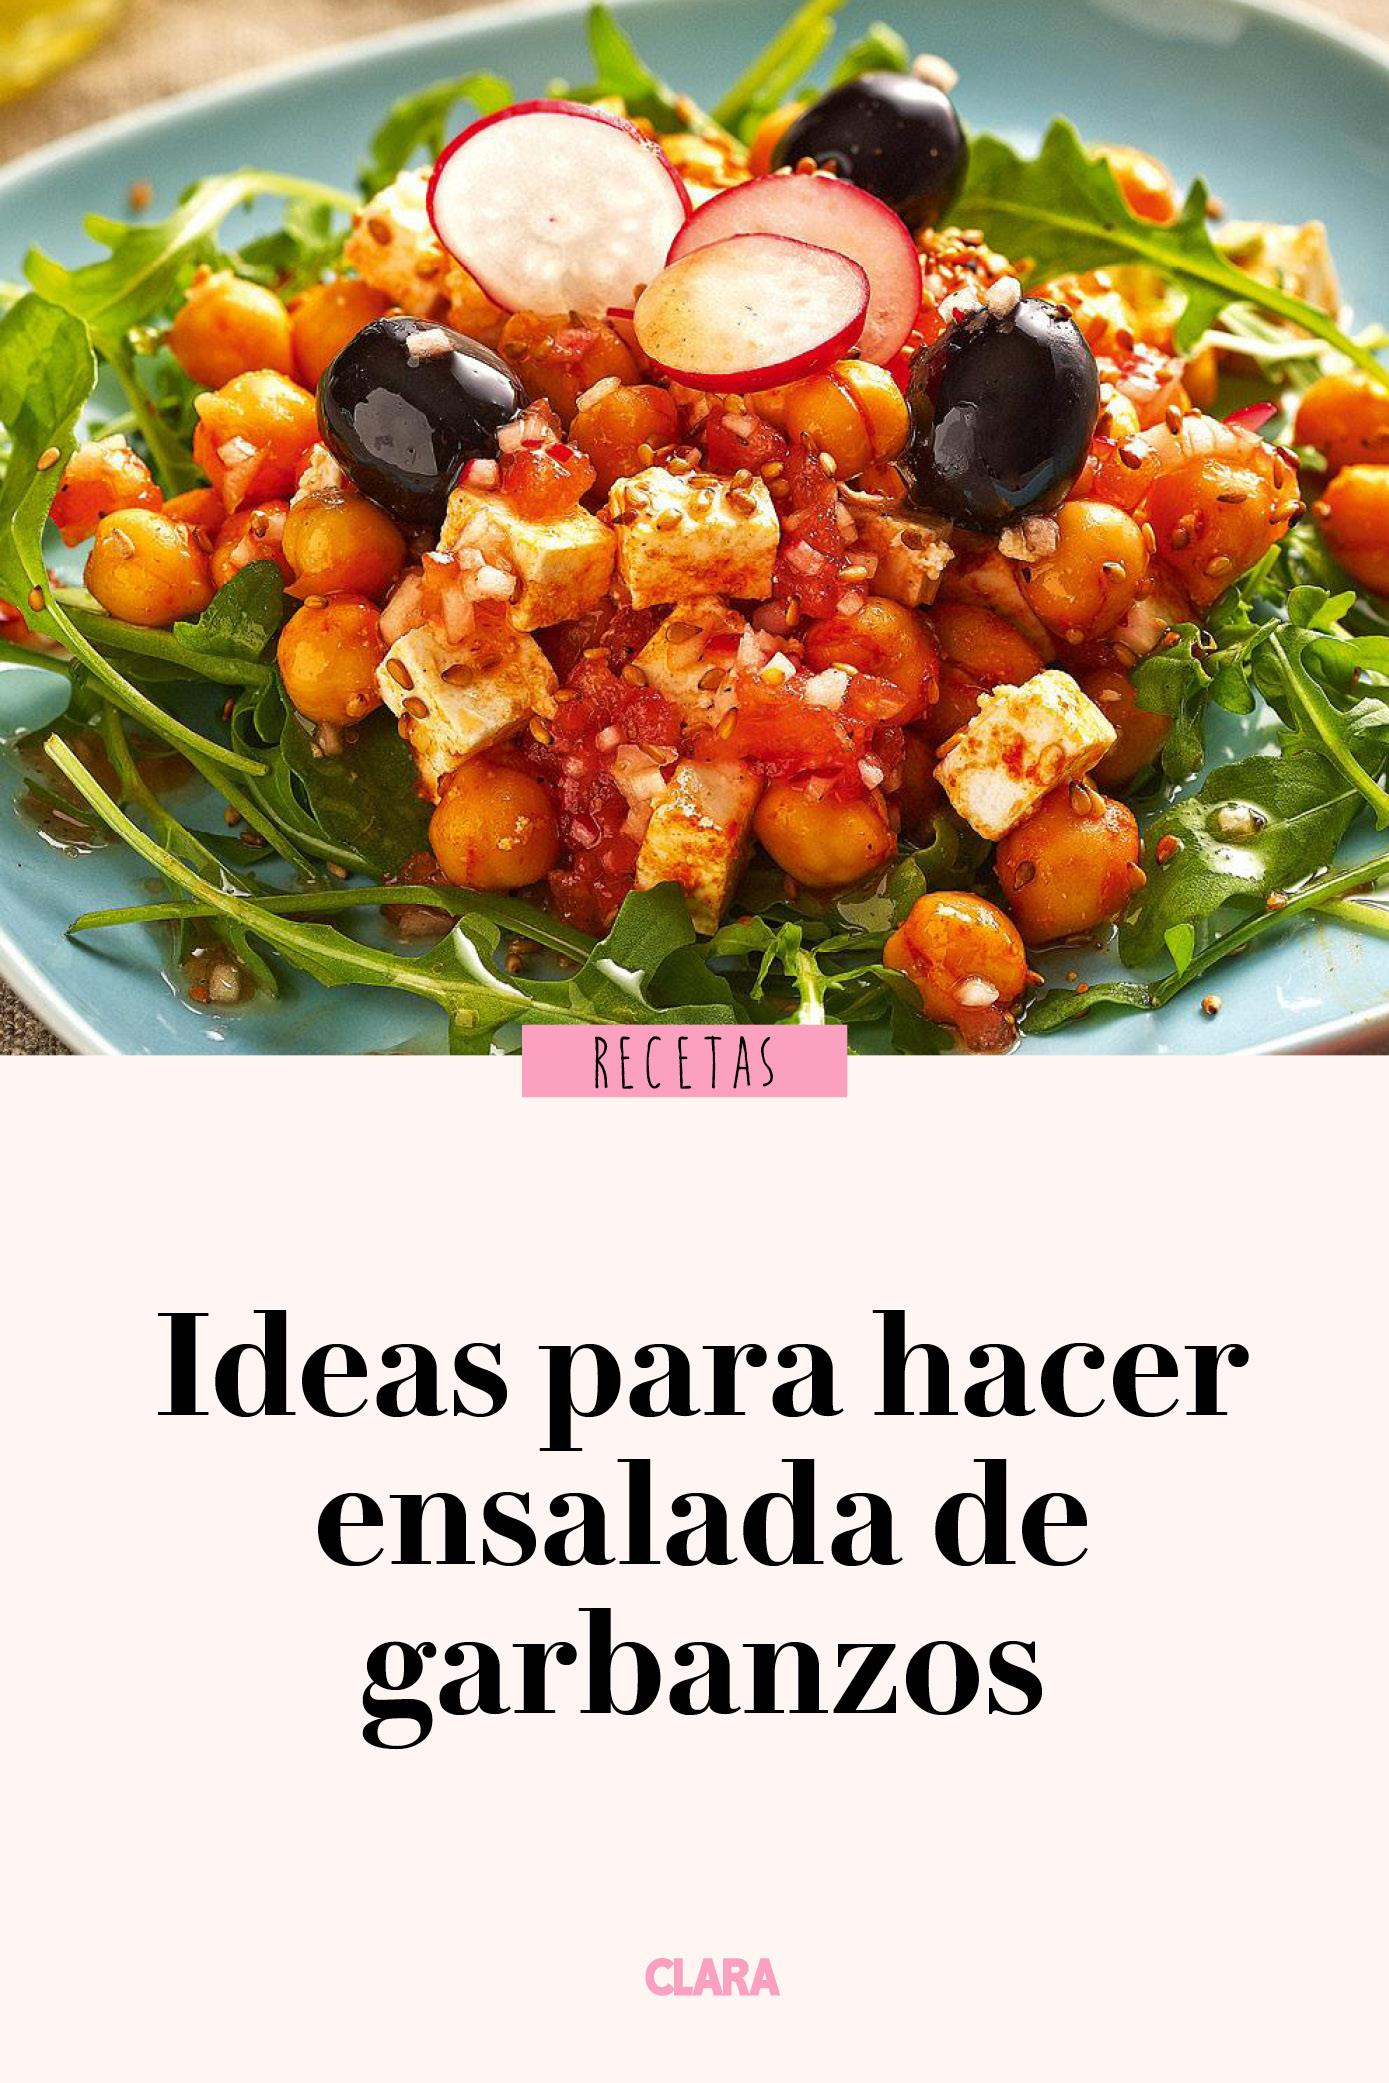 11 Ideas Para Hacer Ensalada De Garbanzos